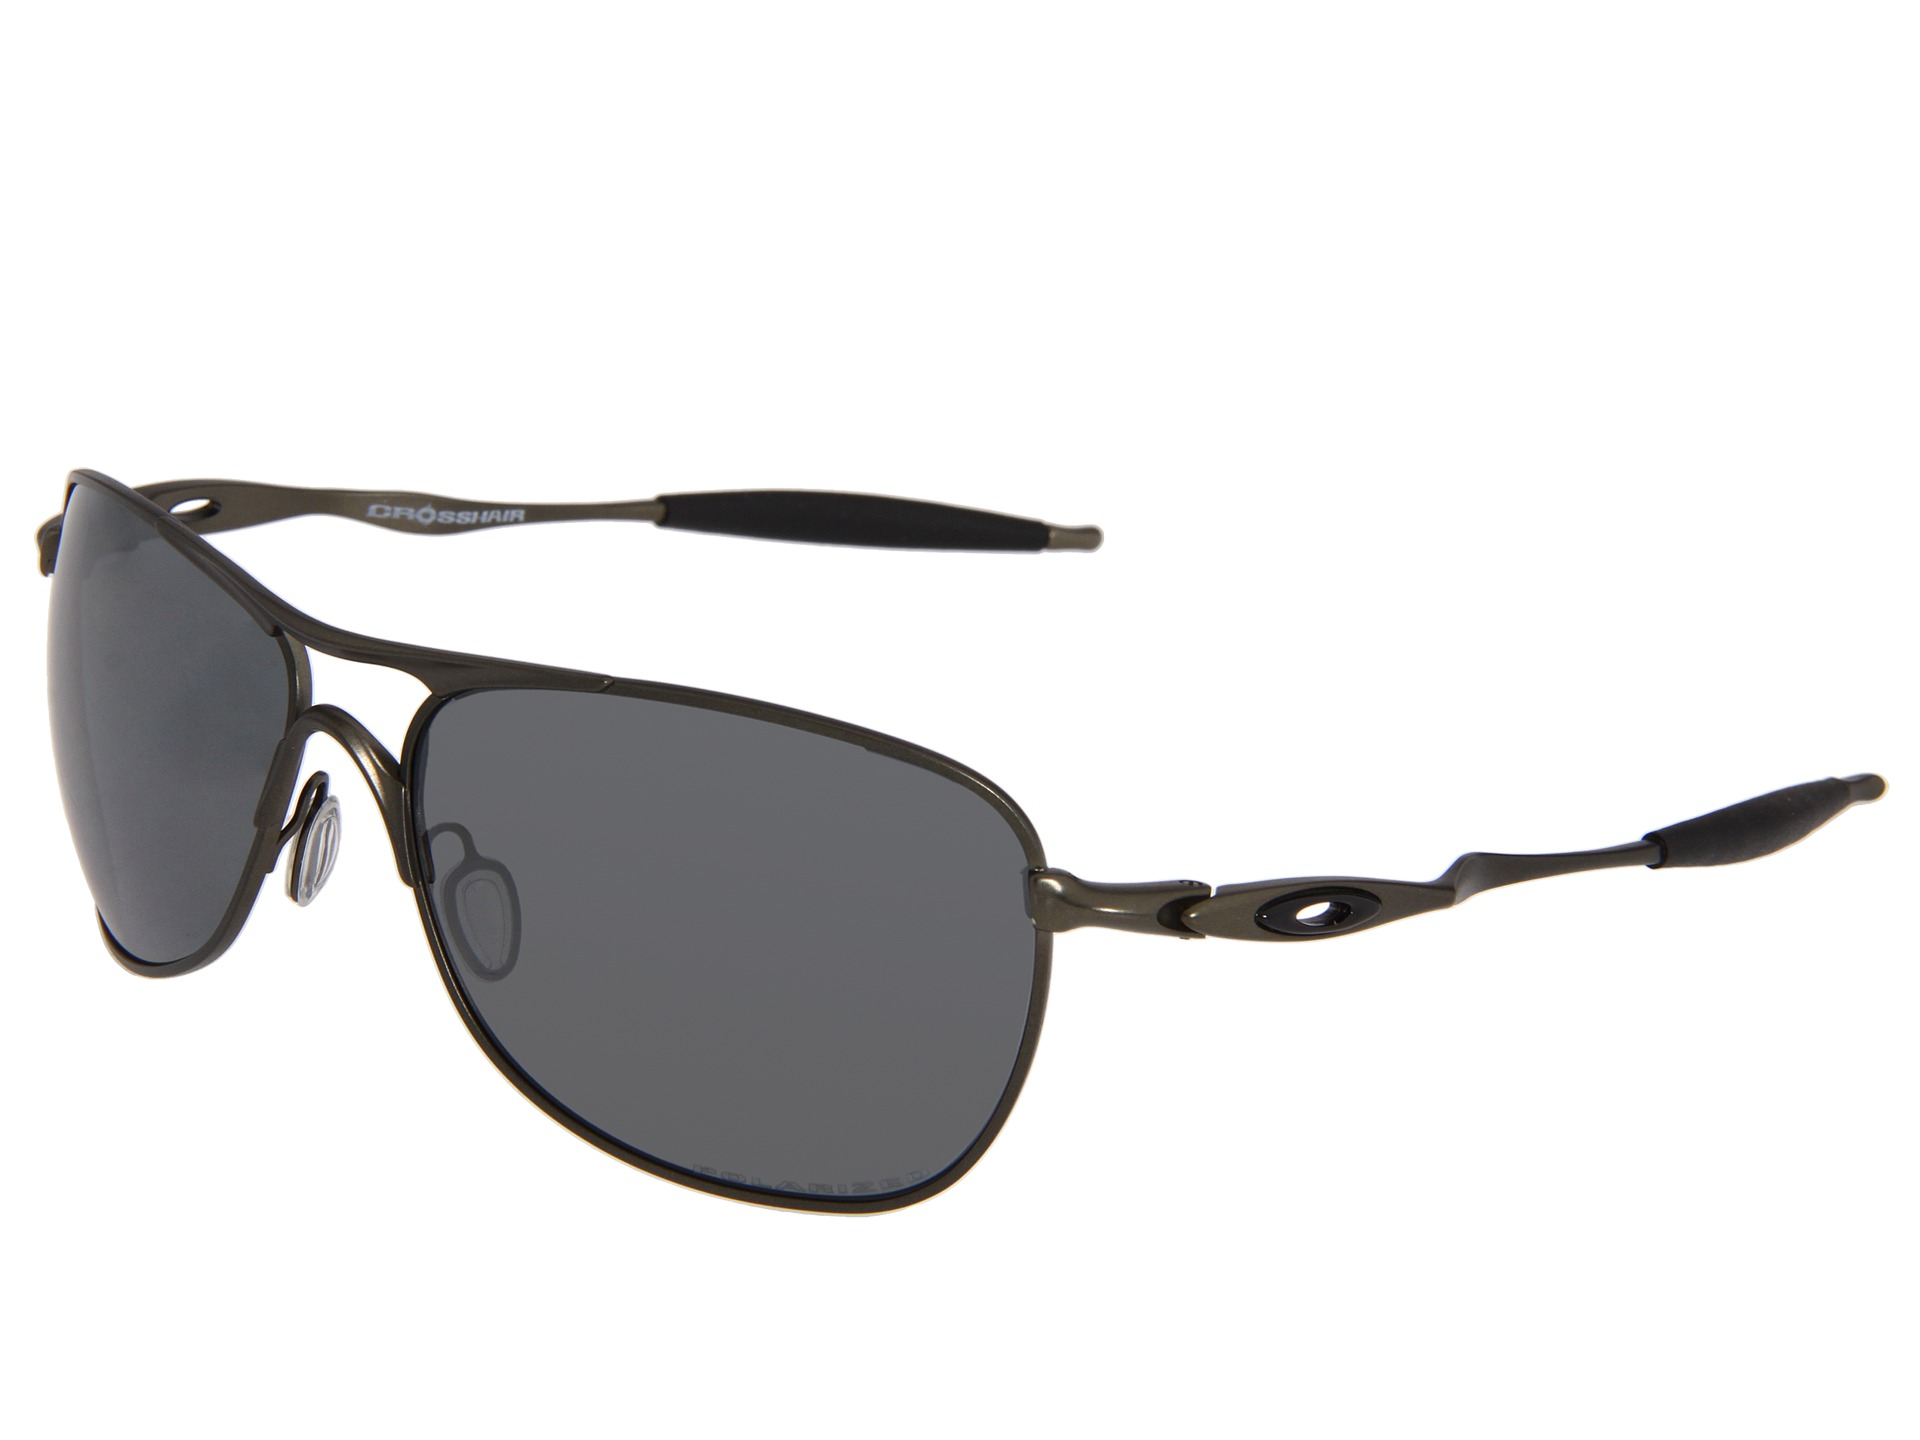 214a4f2bea Oakley Crosshair Pewter Black Iridium « Heritage Malta